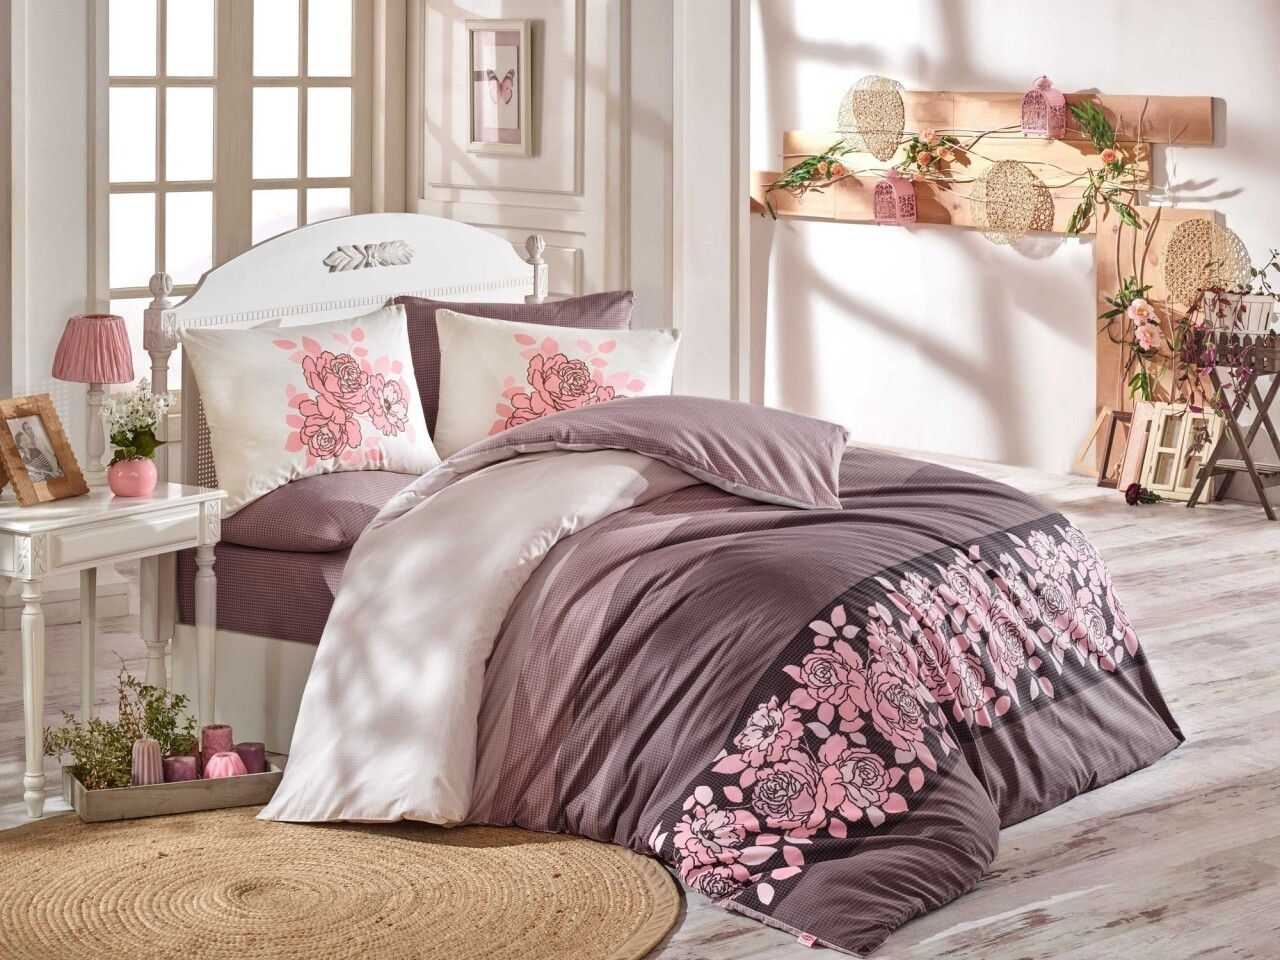 Lenjerie de pat pentru o persoana, 3 piese, 100% bumbac ranforce, Hobby, Martina, roz/bej